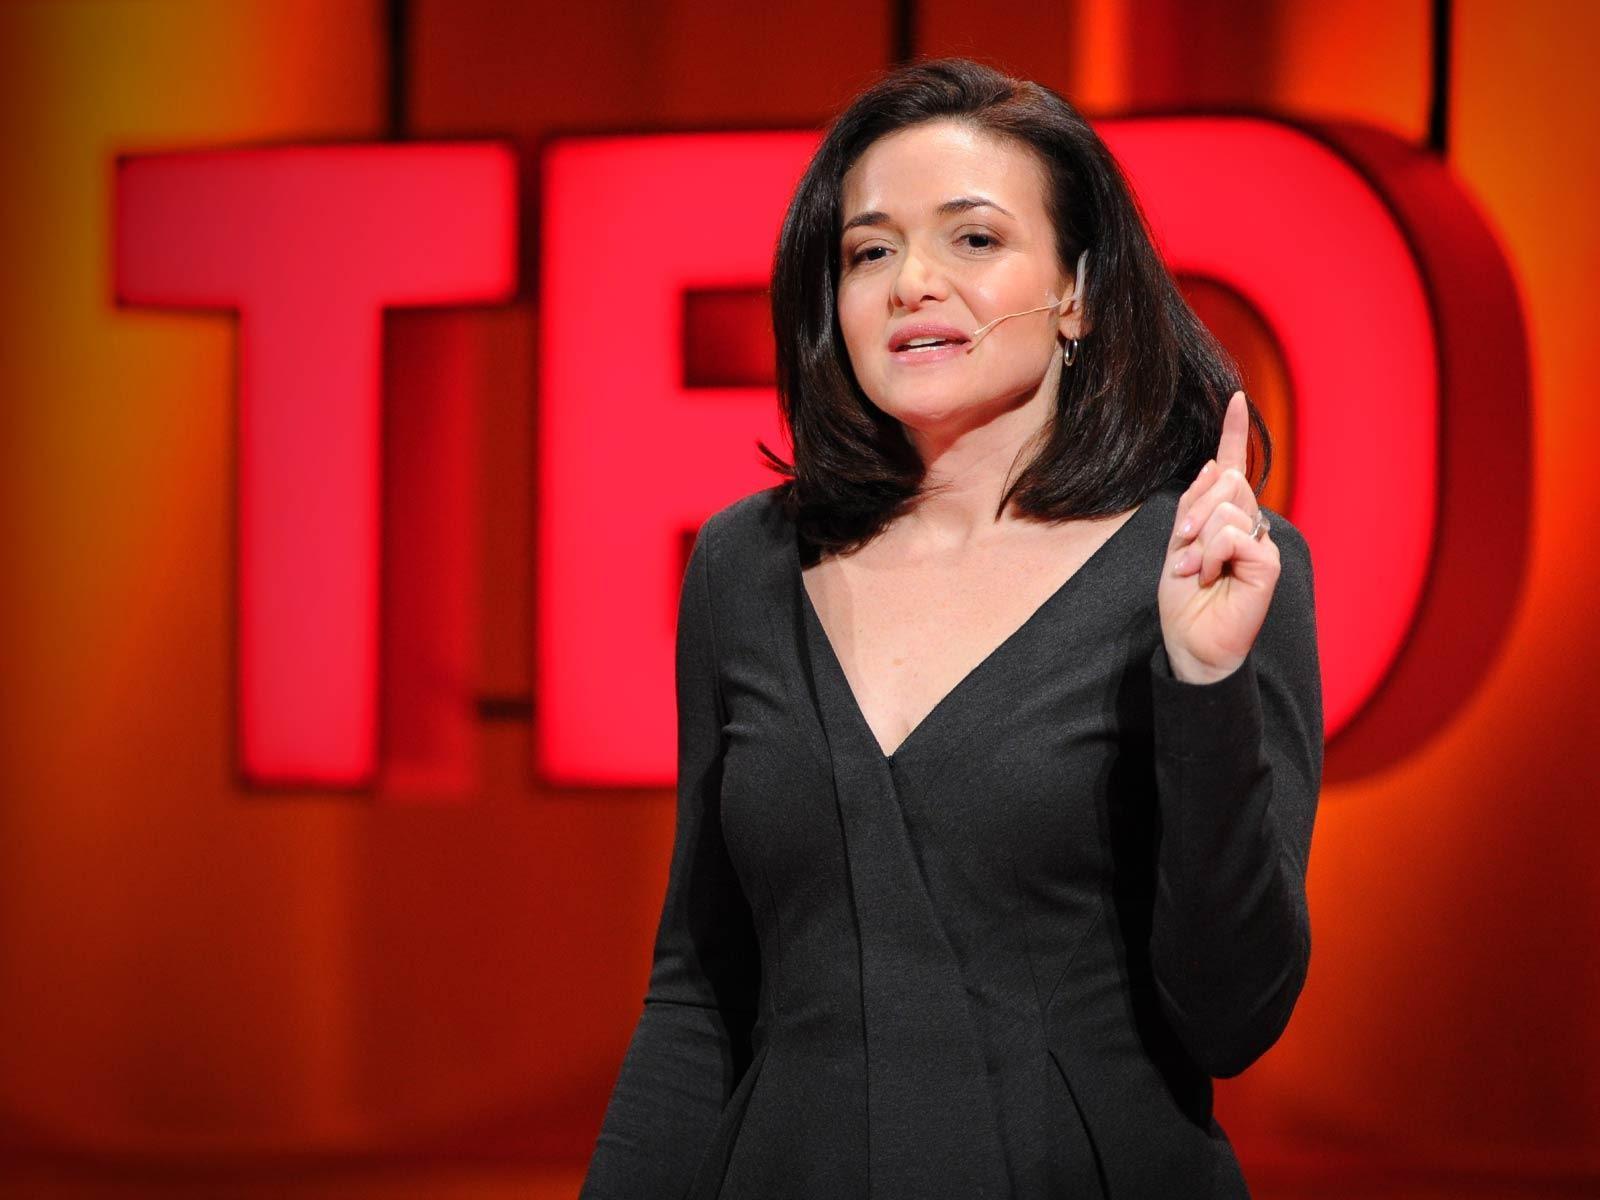 「Sheryl Sandberg:為什麼我們的女性領袖太少」- Why We Have Too Few Women Leaders